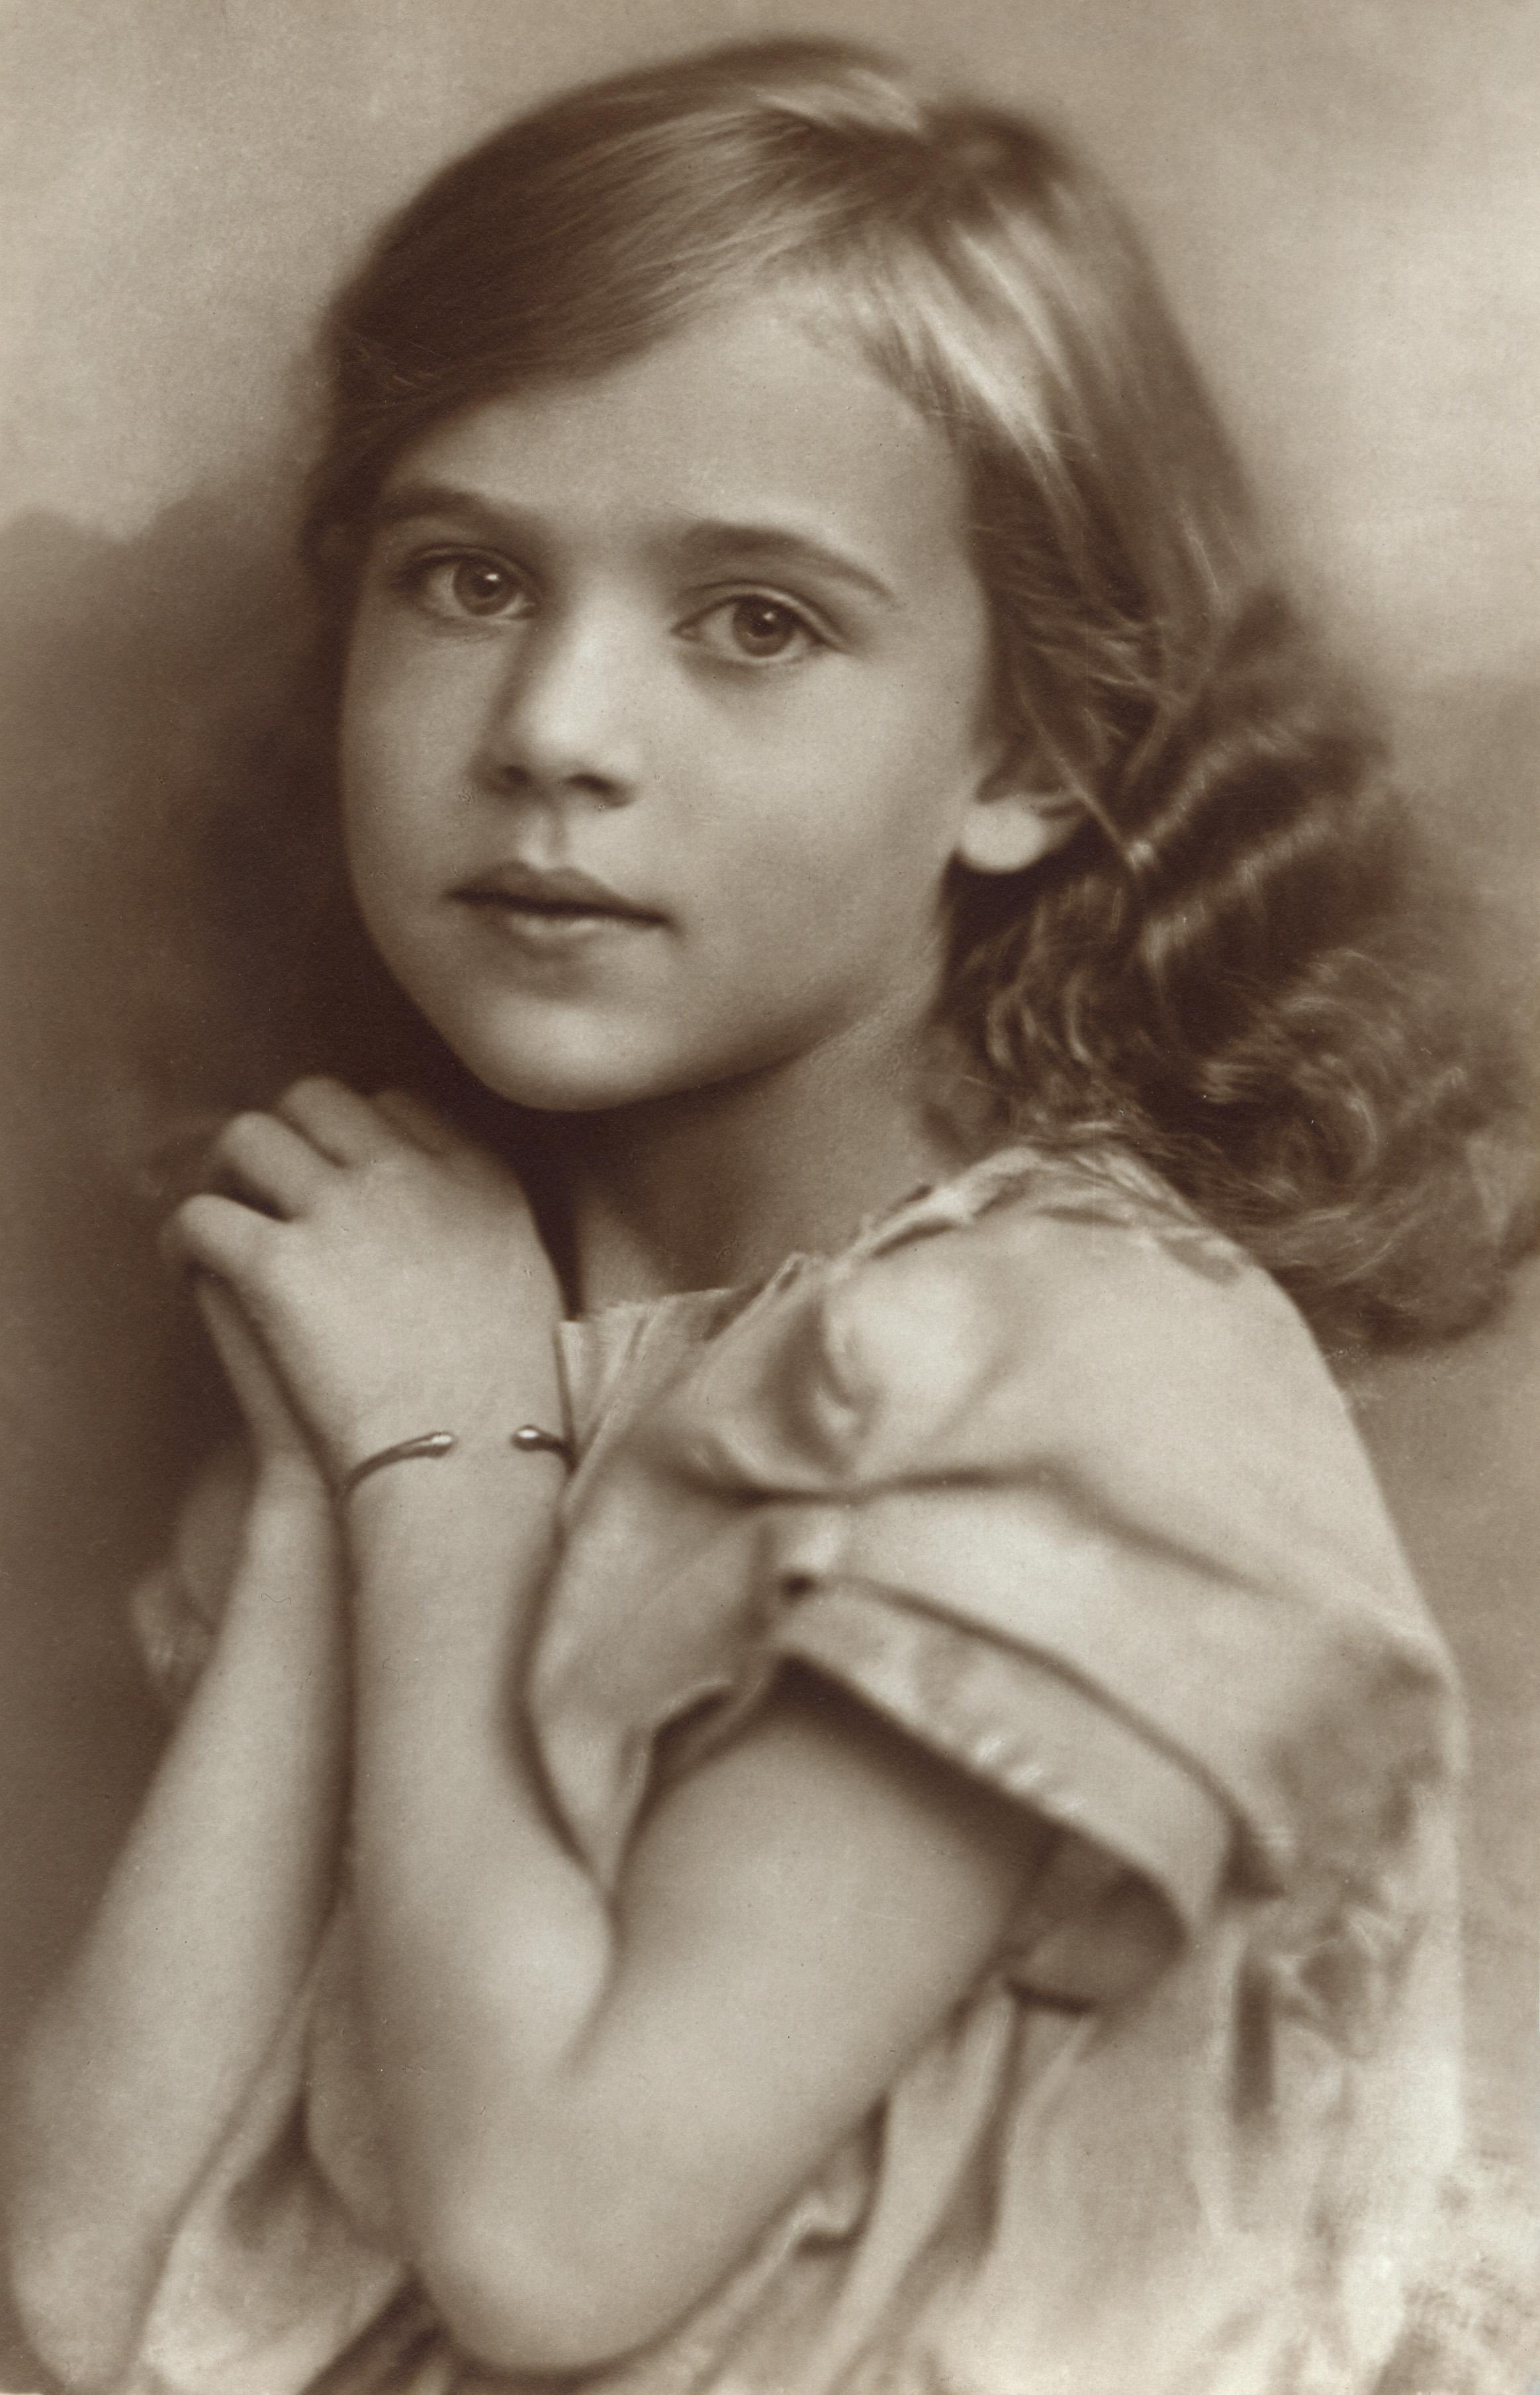 Vintage Prinzessin Ingrid